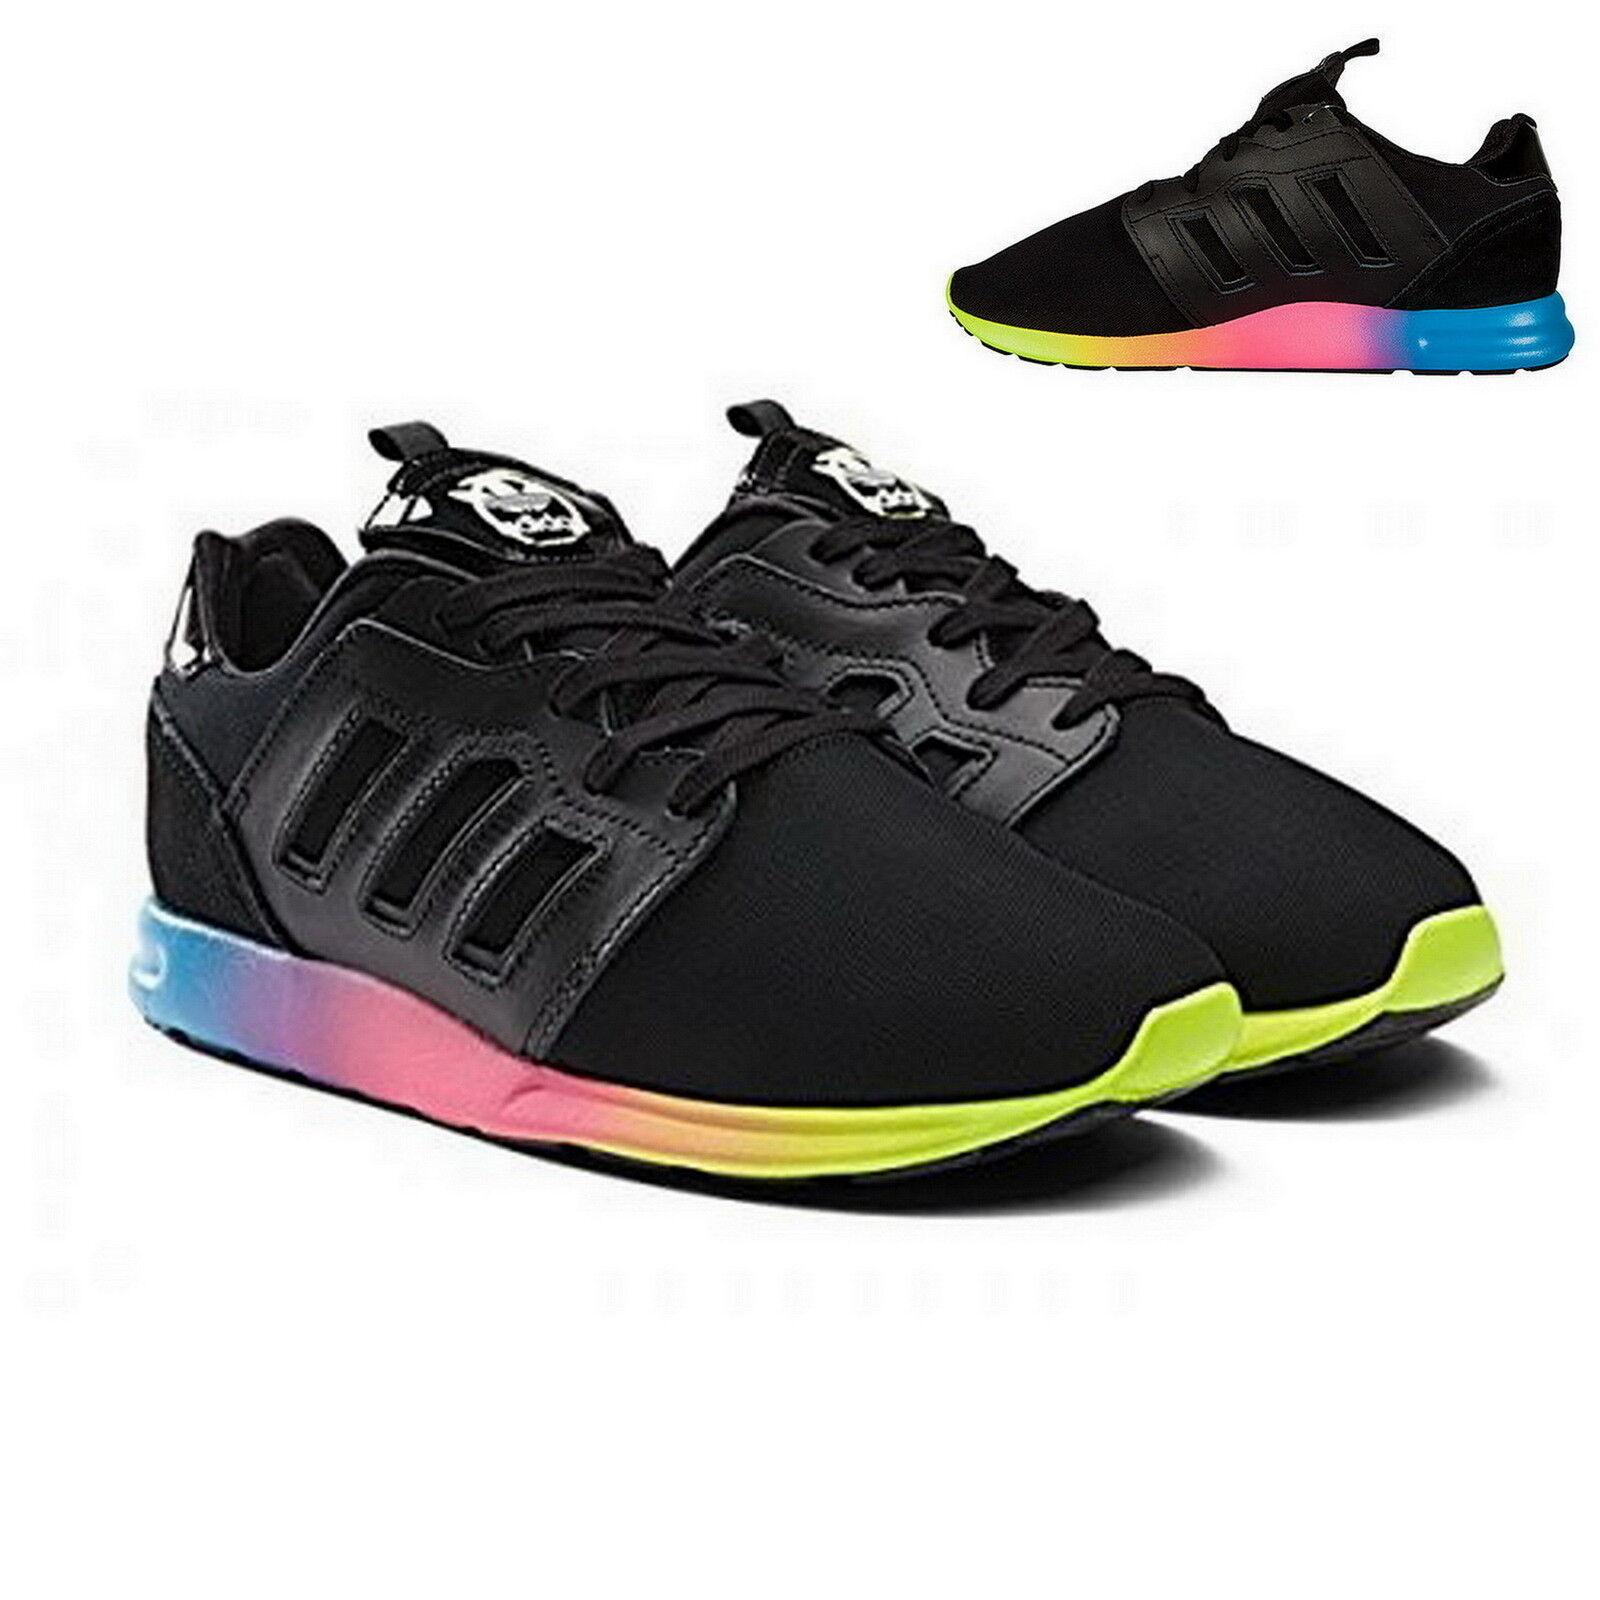 Adidas ZX Ora 500 2.0 Rita Ora ZX señora Core m19079 negro/multi 1a2009